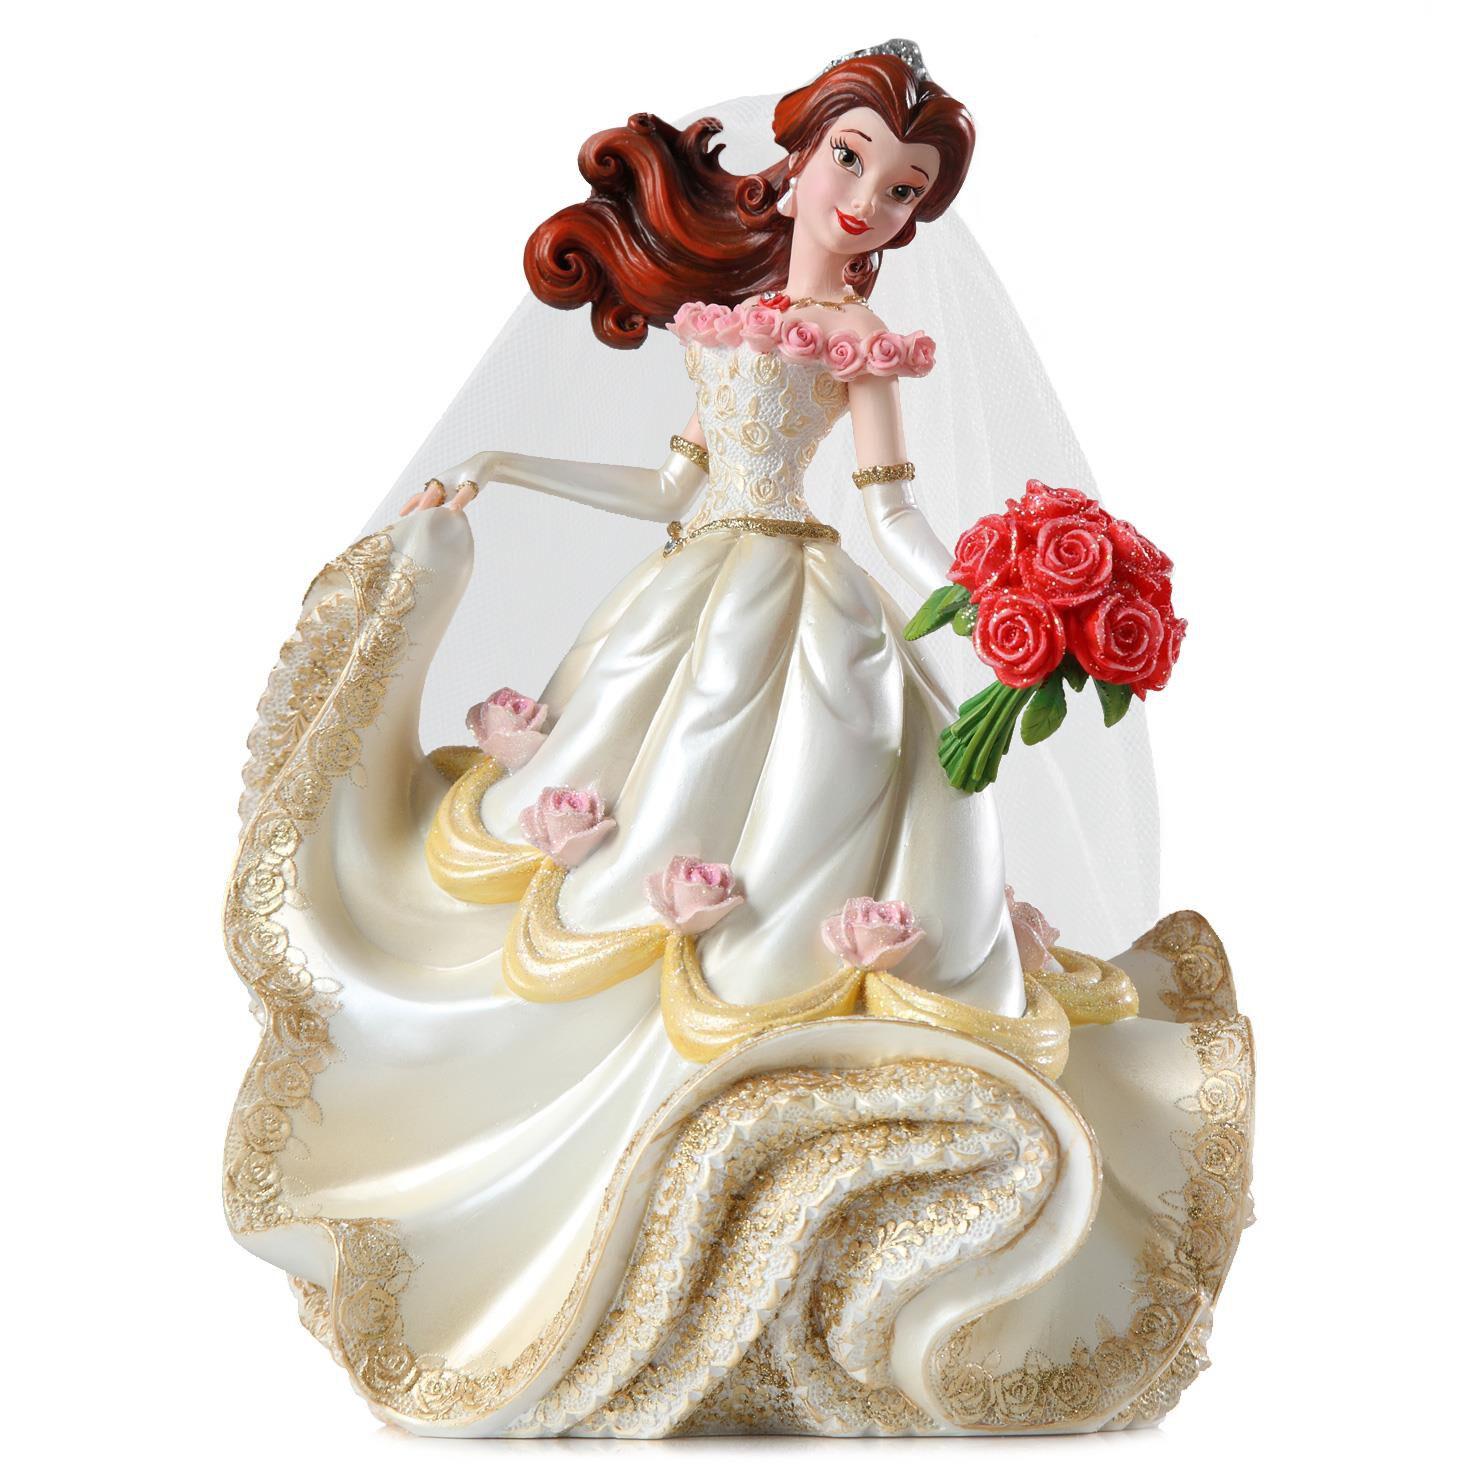 Belle ornament disney - Belle Ornament Disney 45